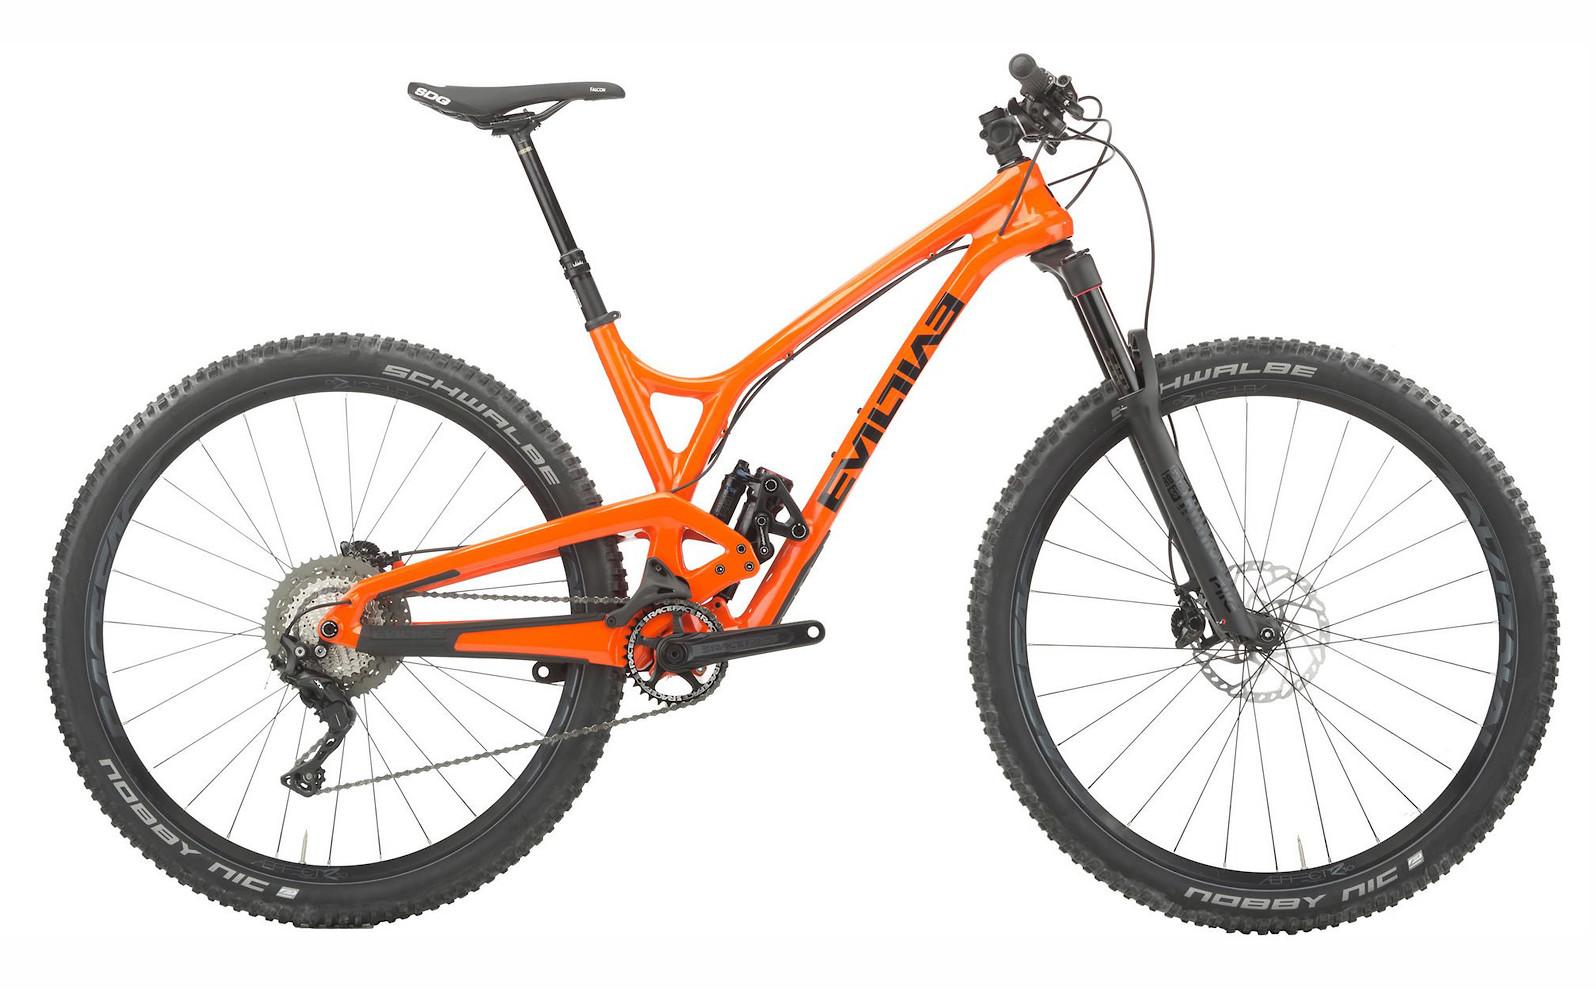 Evil Following MB XT Jenson Spec-A Bike (Smashing Pumpkin)